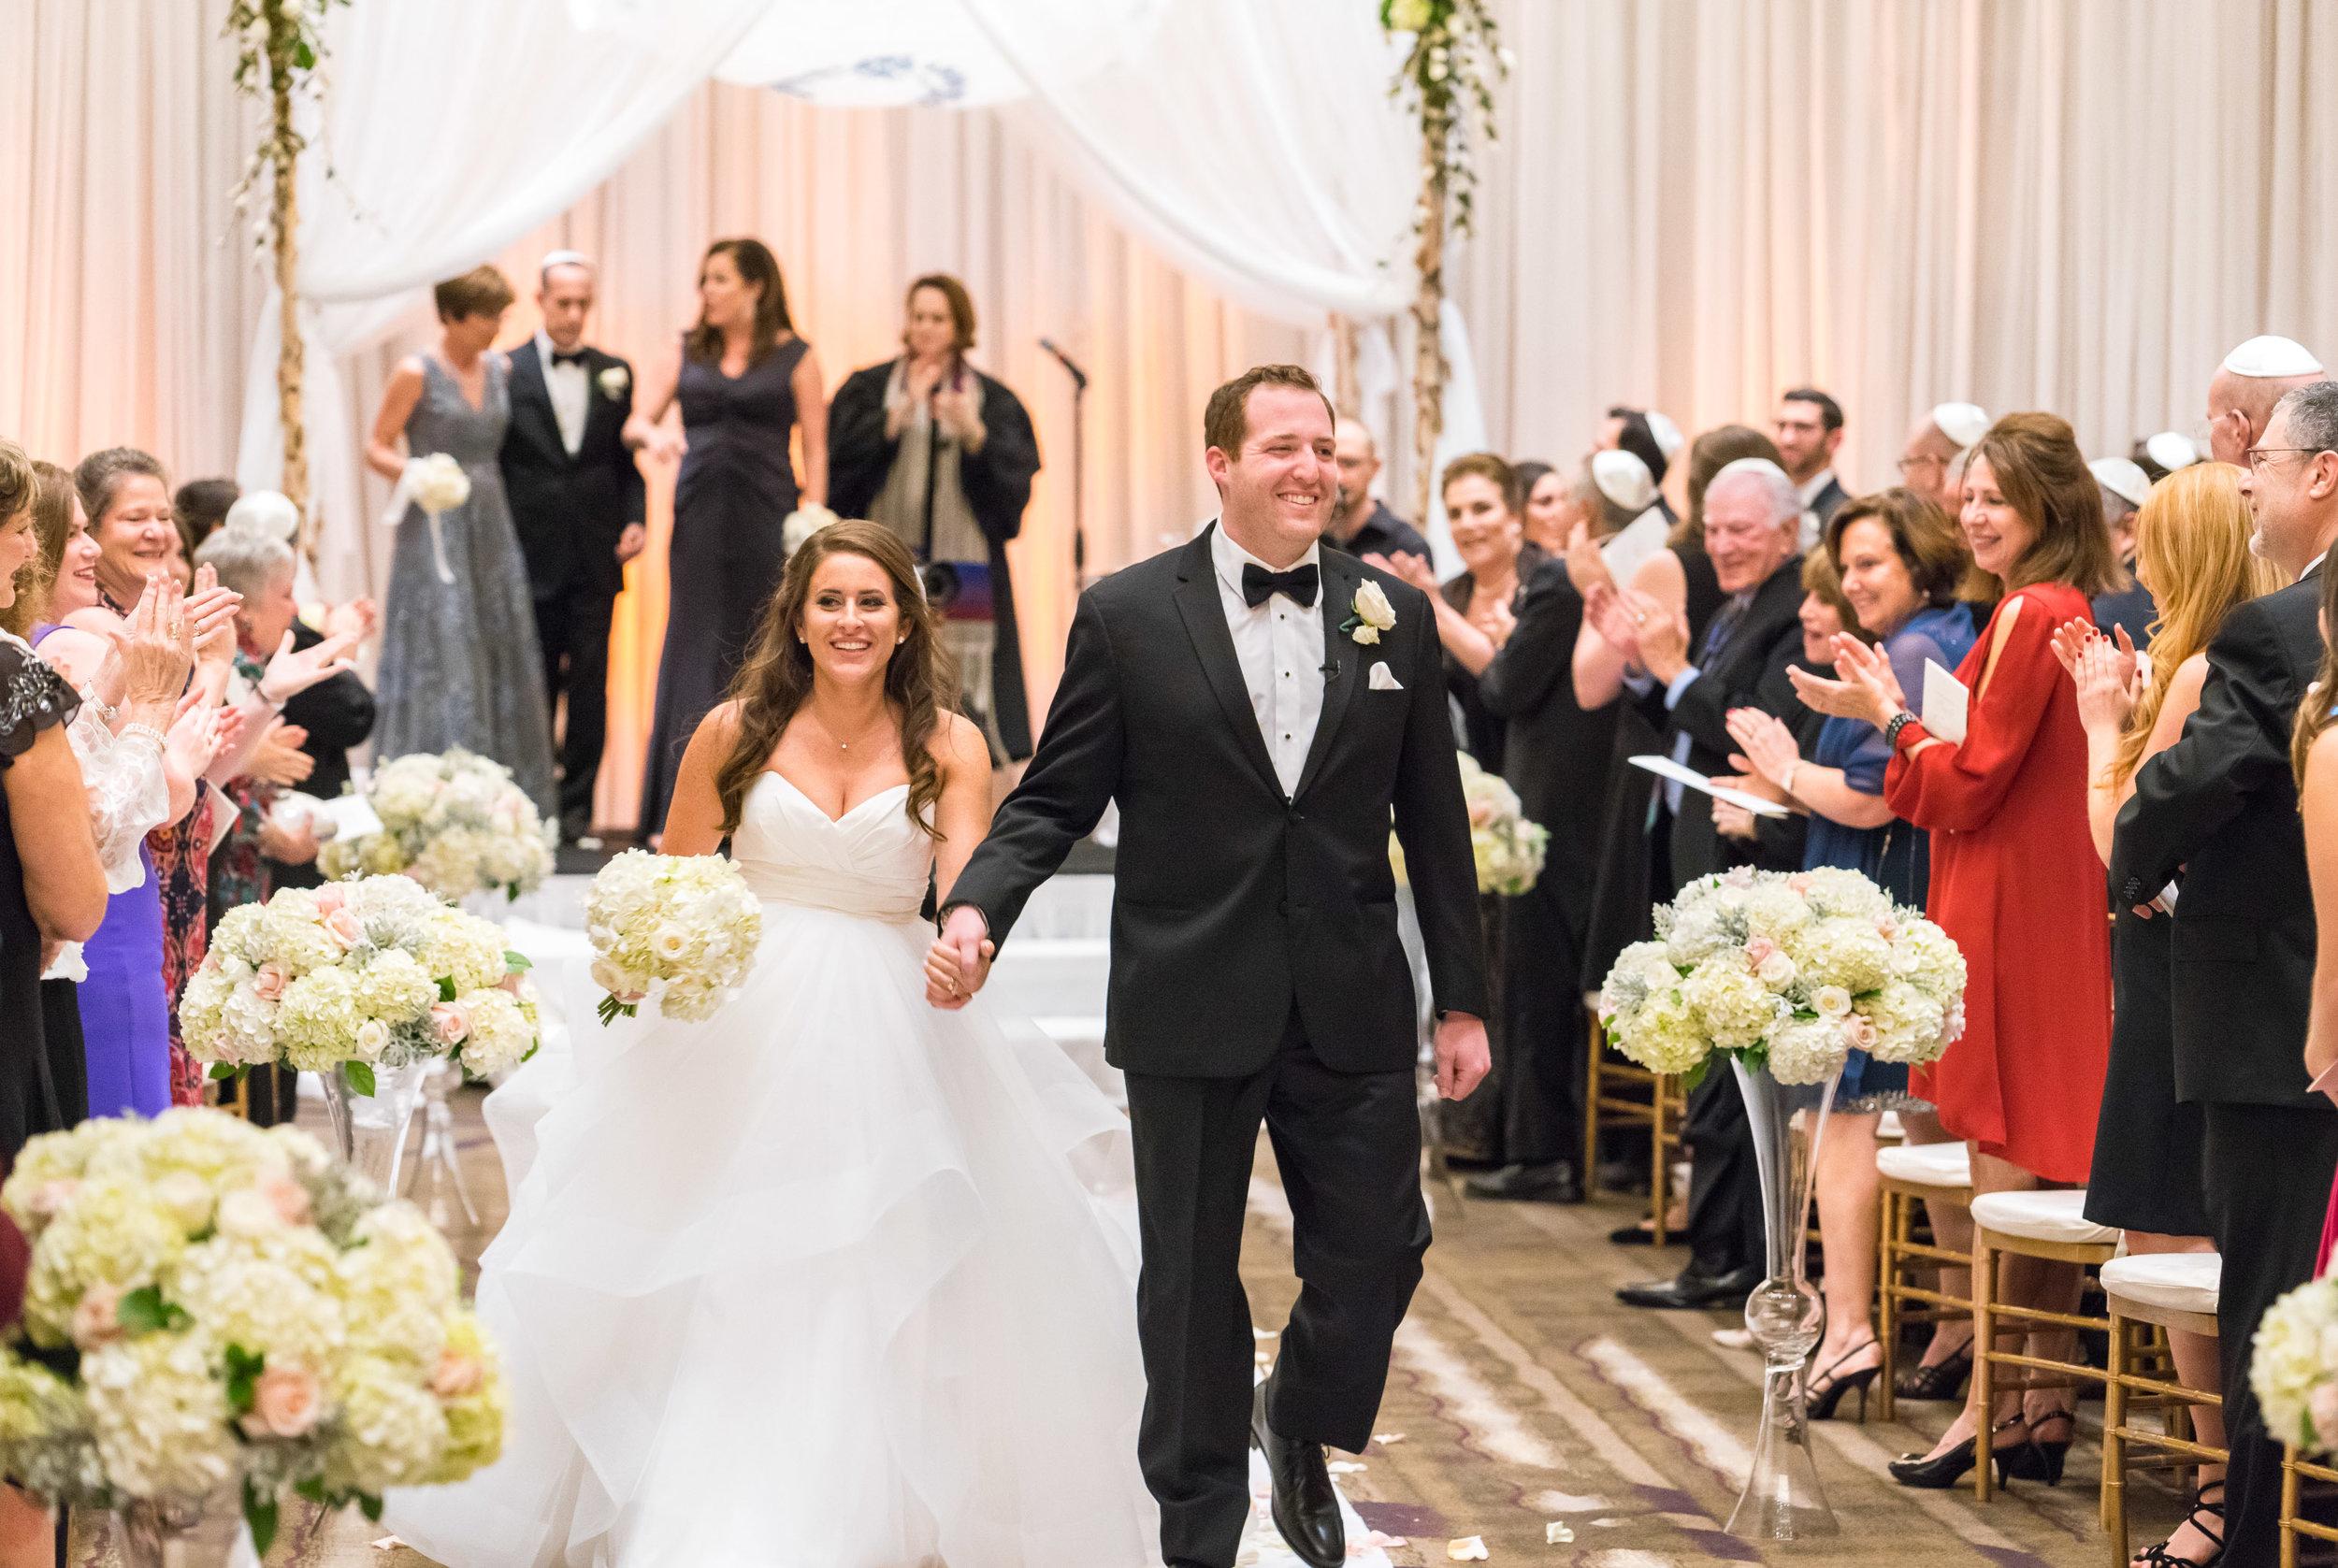 gorgeous hayley paige Londyn dress at Jewish wedding in DC